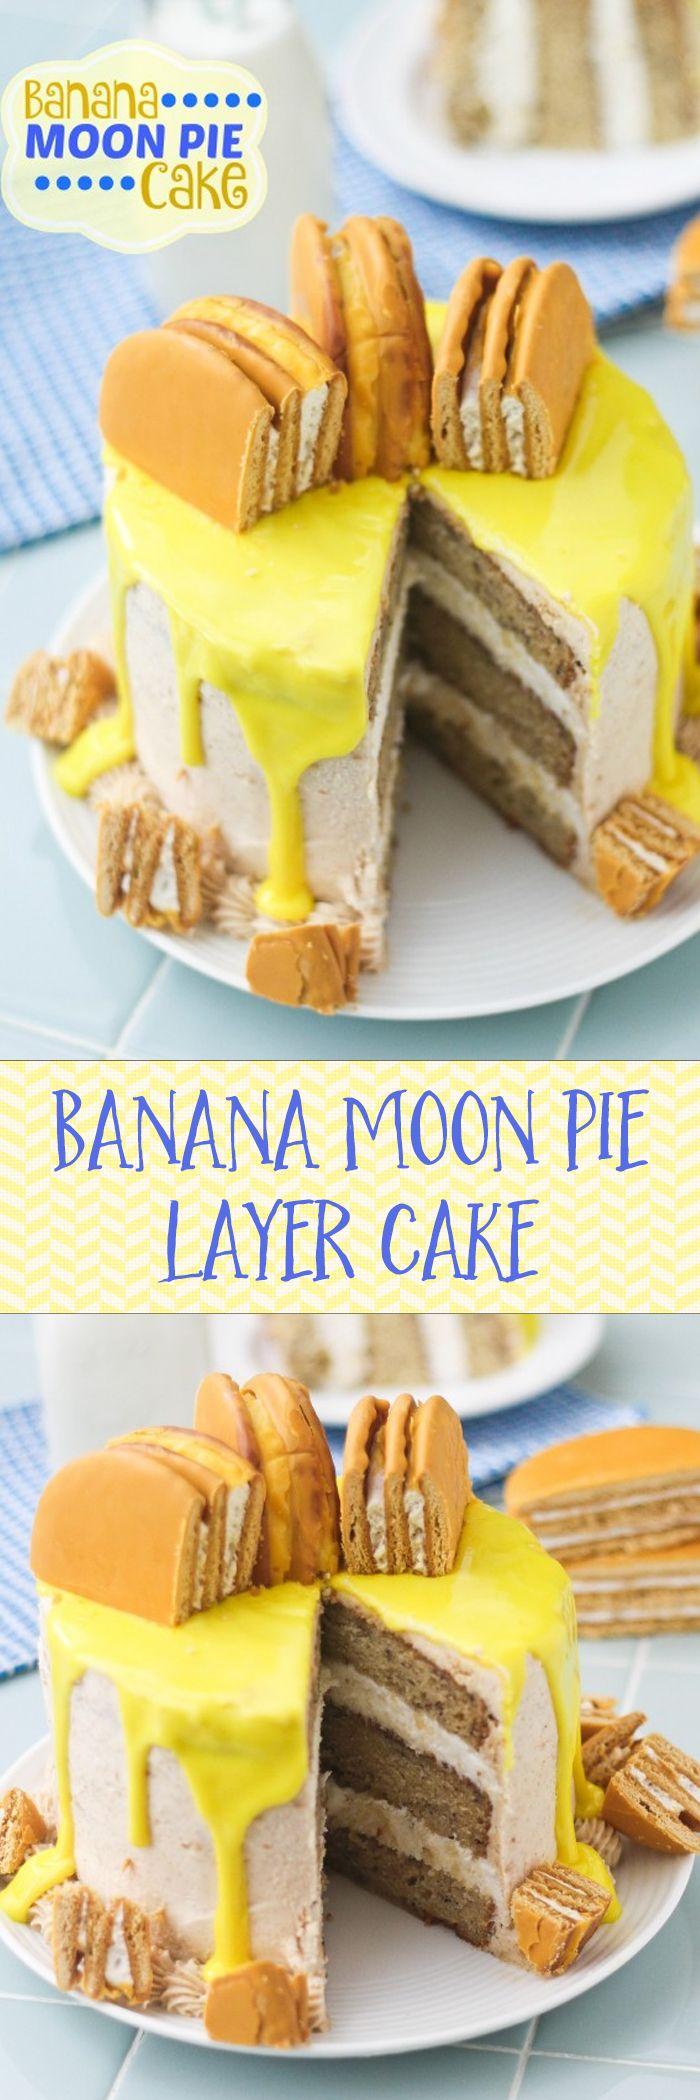 Banana Moon Pie Layer Cake (WITH BANANA GLAZE!!!)